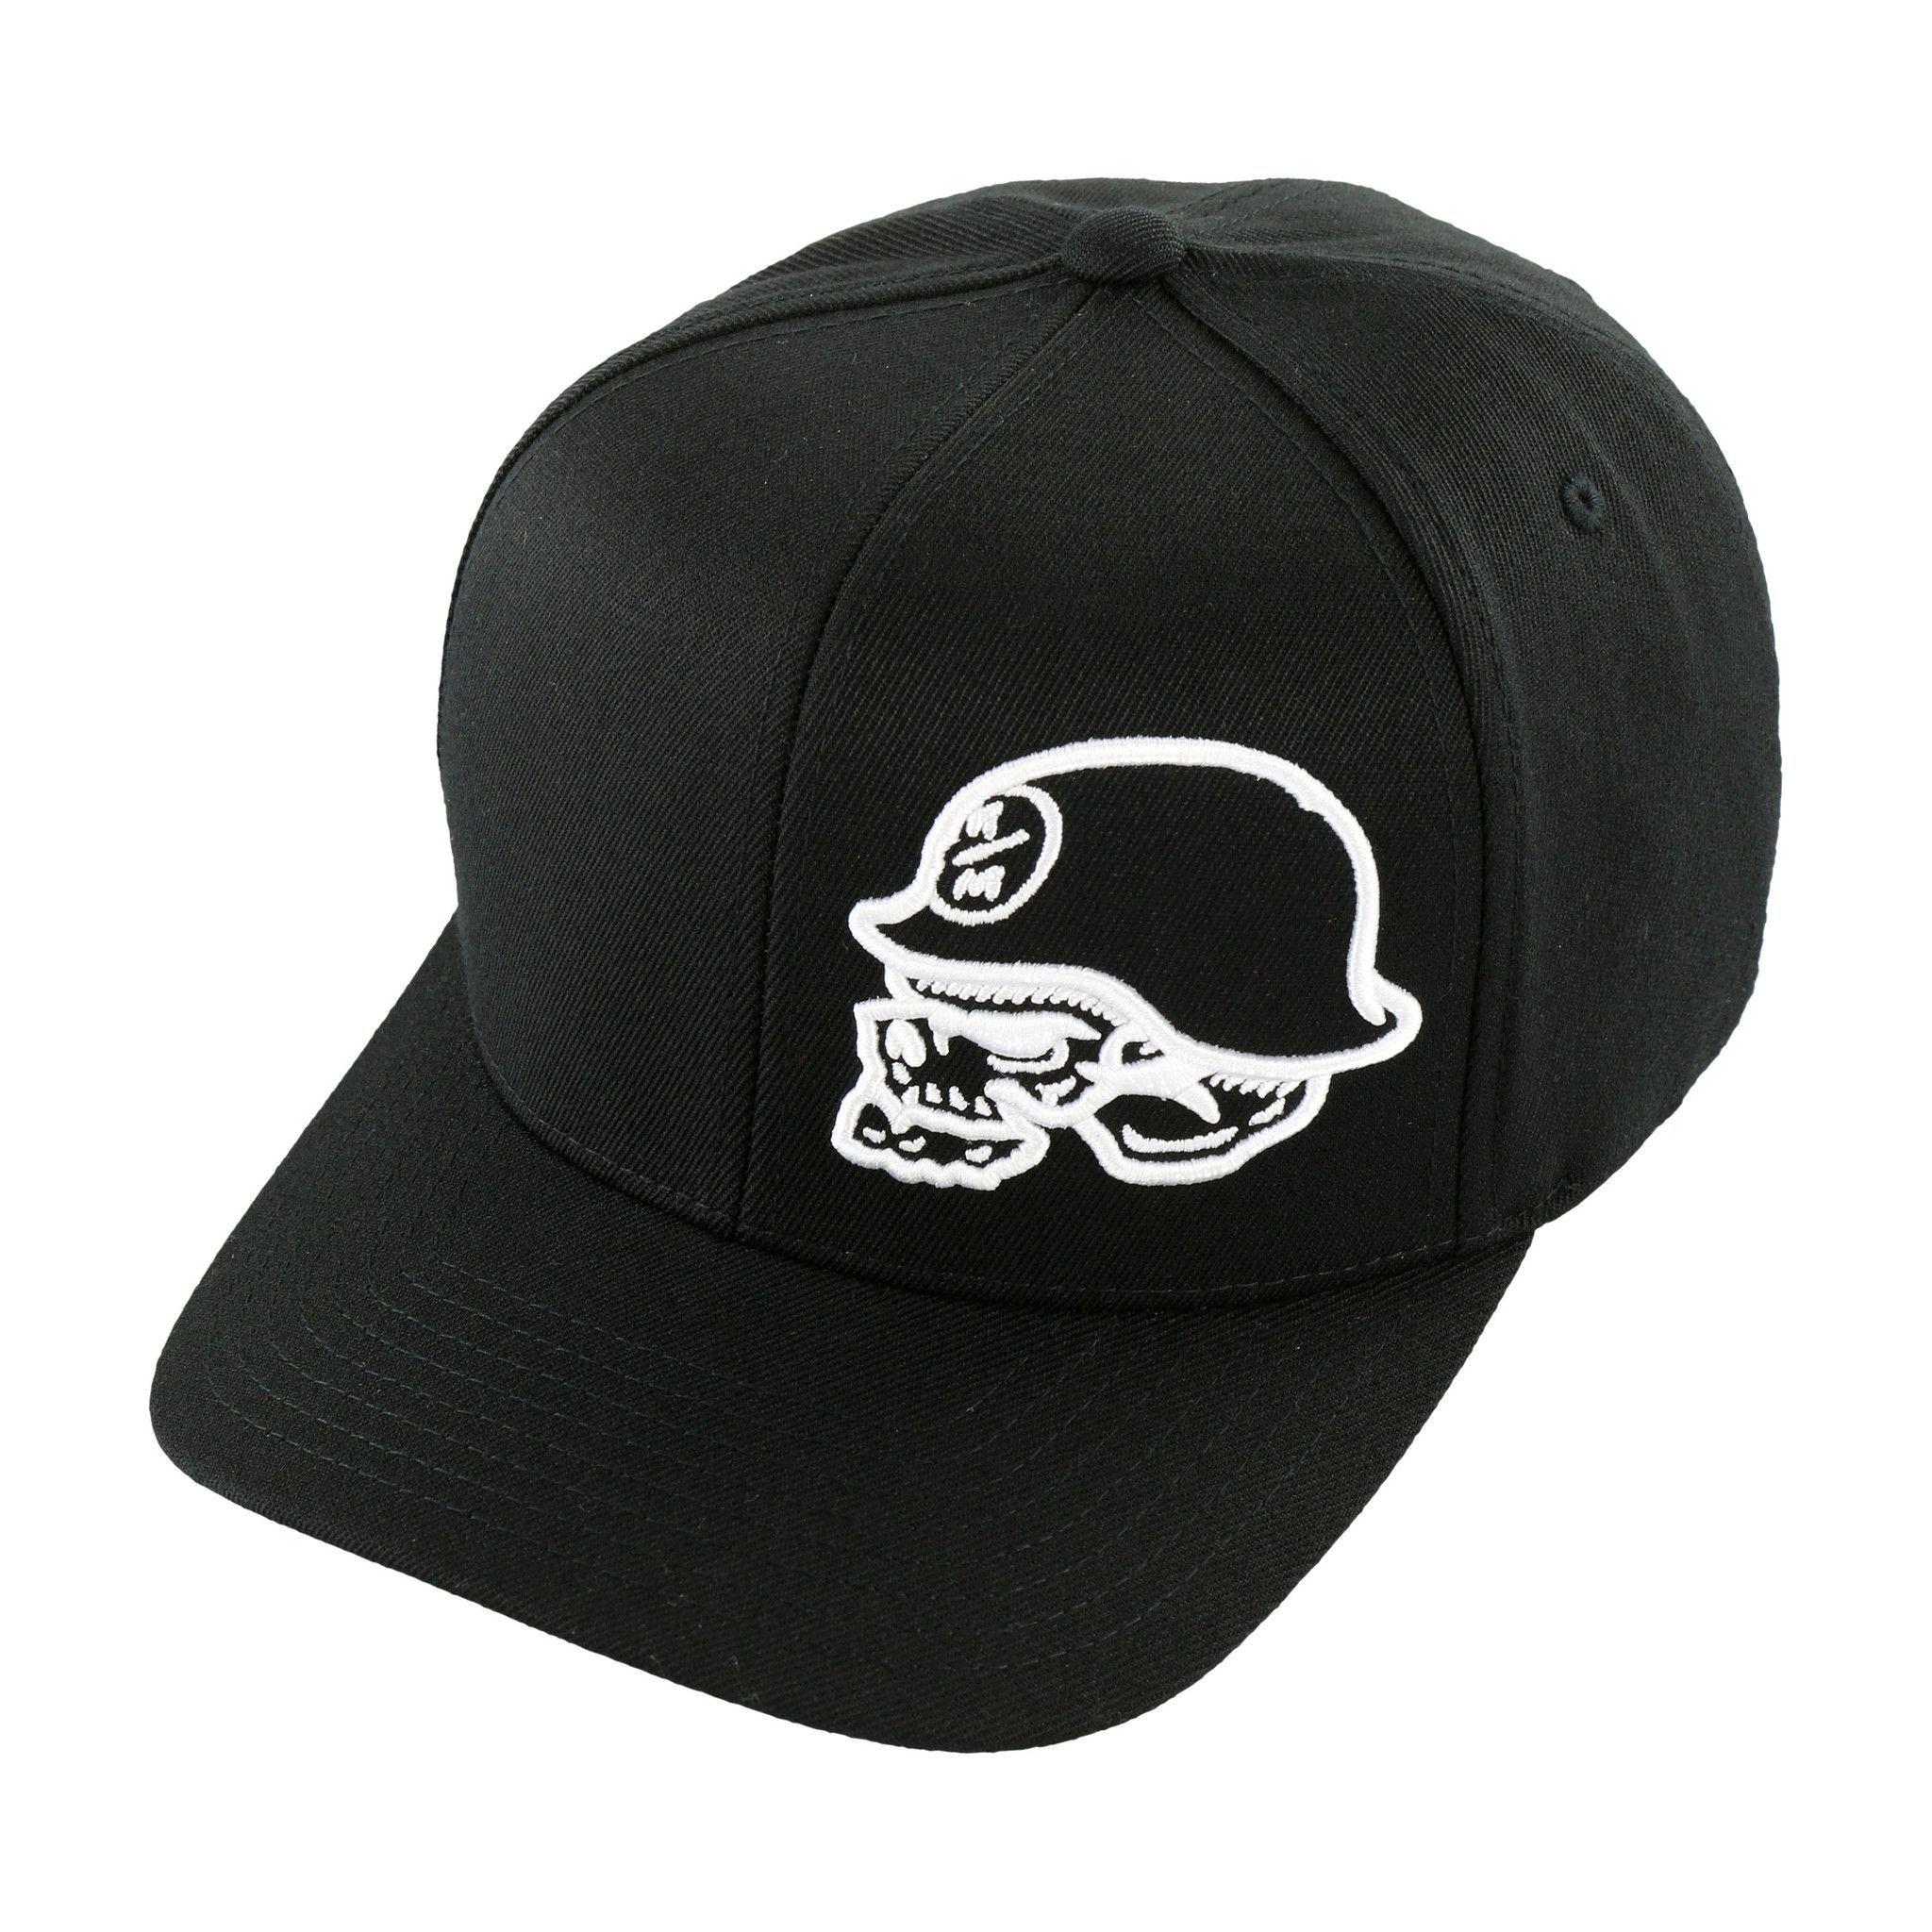 7edc8e89 Metal Mulisha Men's Merit Curved Bill Hat | Products | Hats, Metal ...